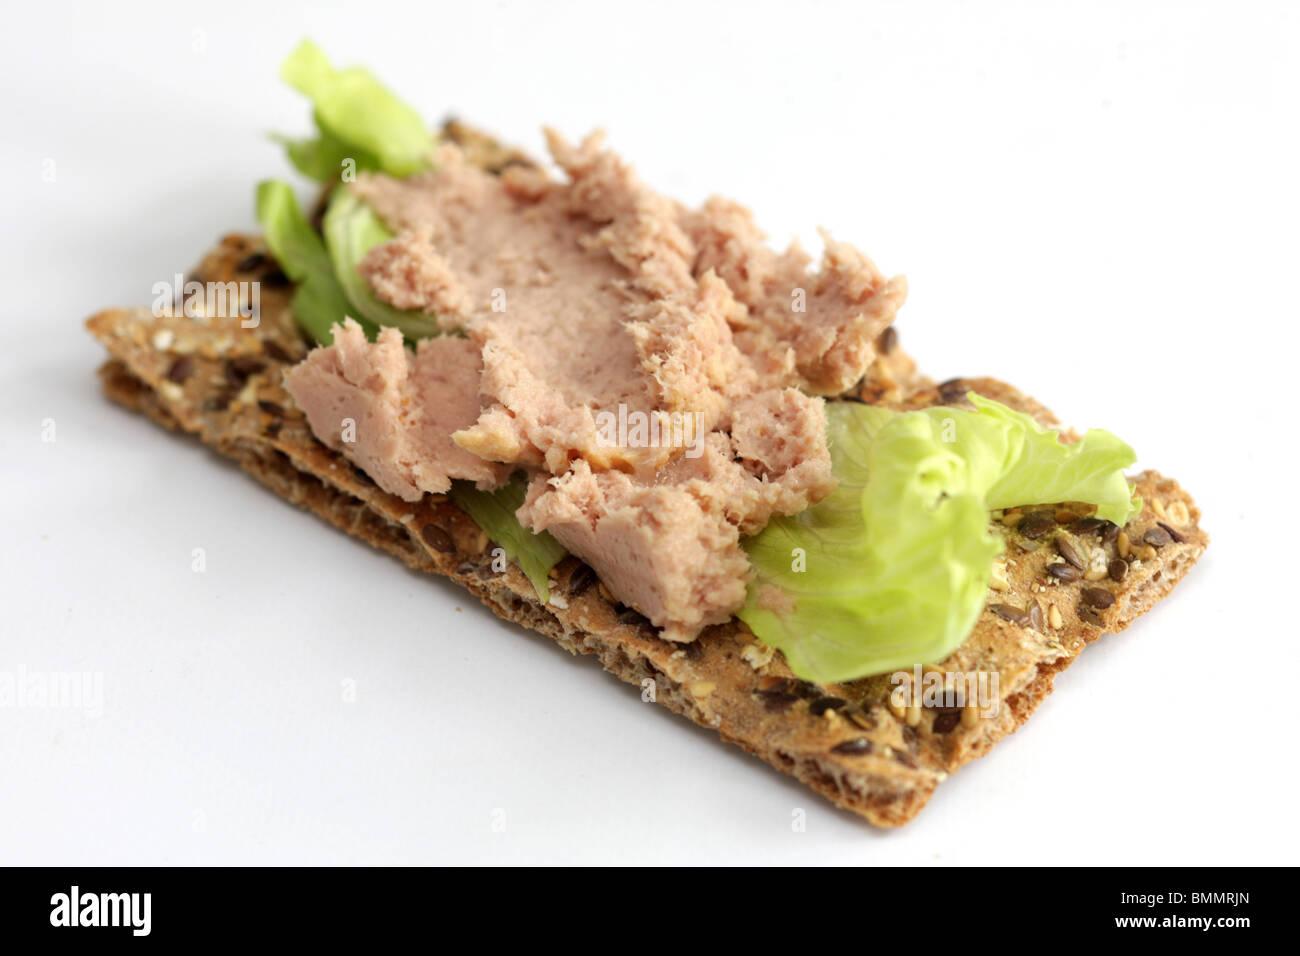 Tuna Pate on Ryvita Crispbread - Stock Image